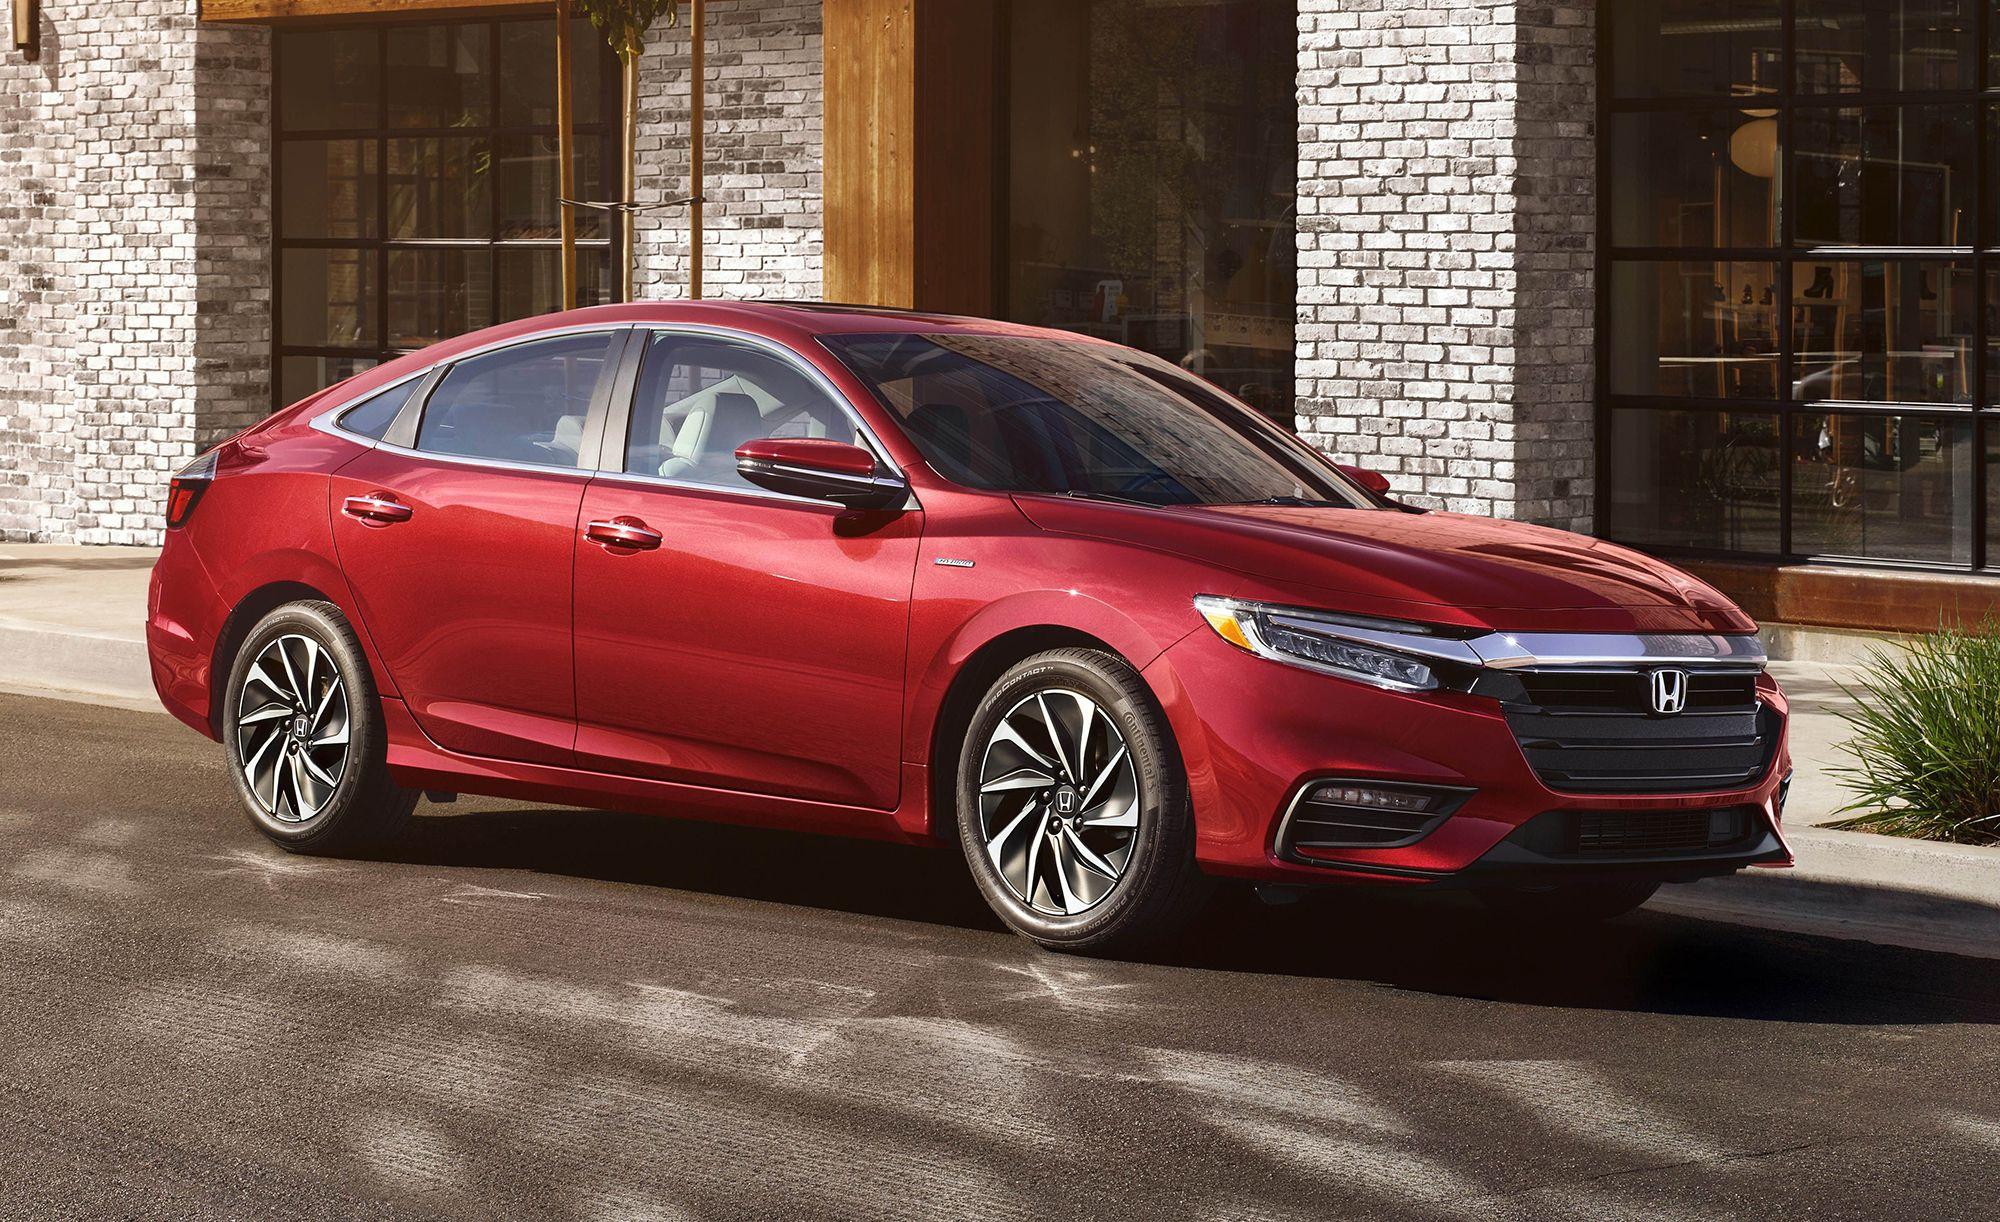 2020 Honda Insight Pricing